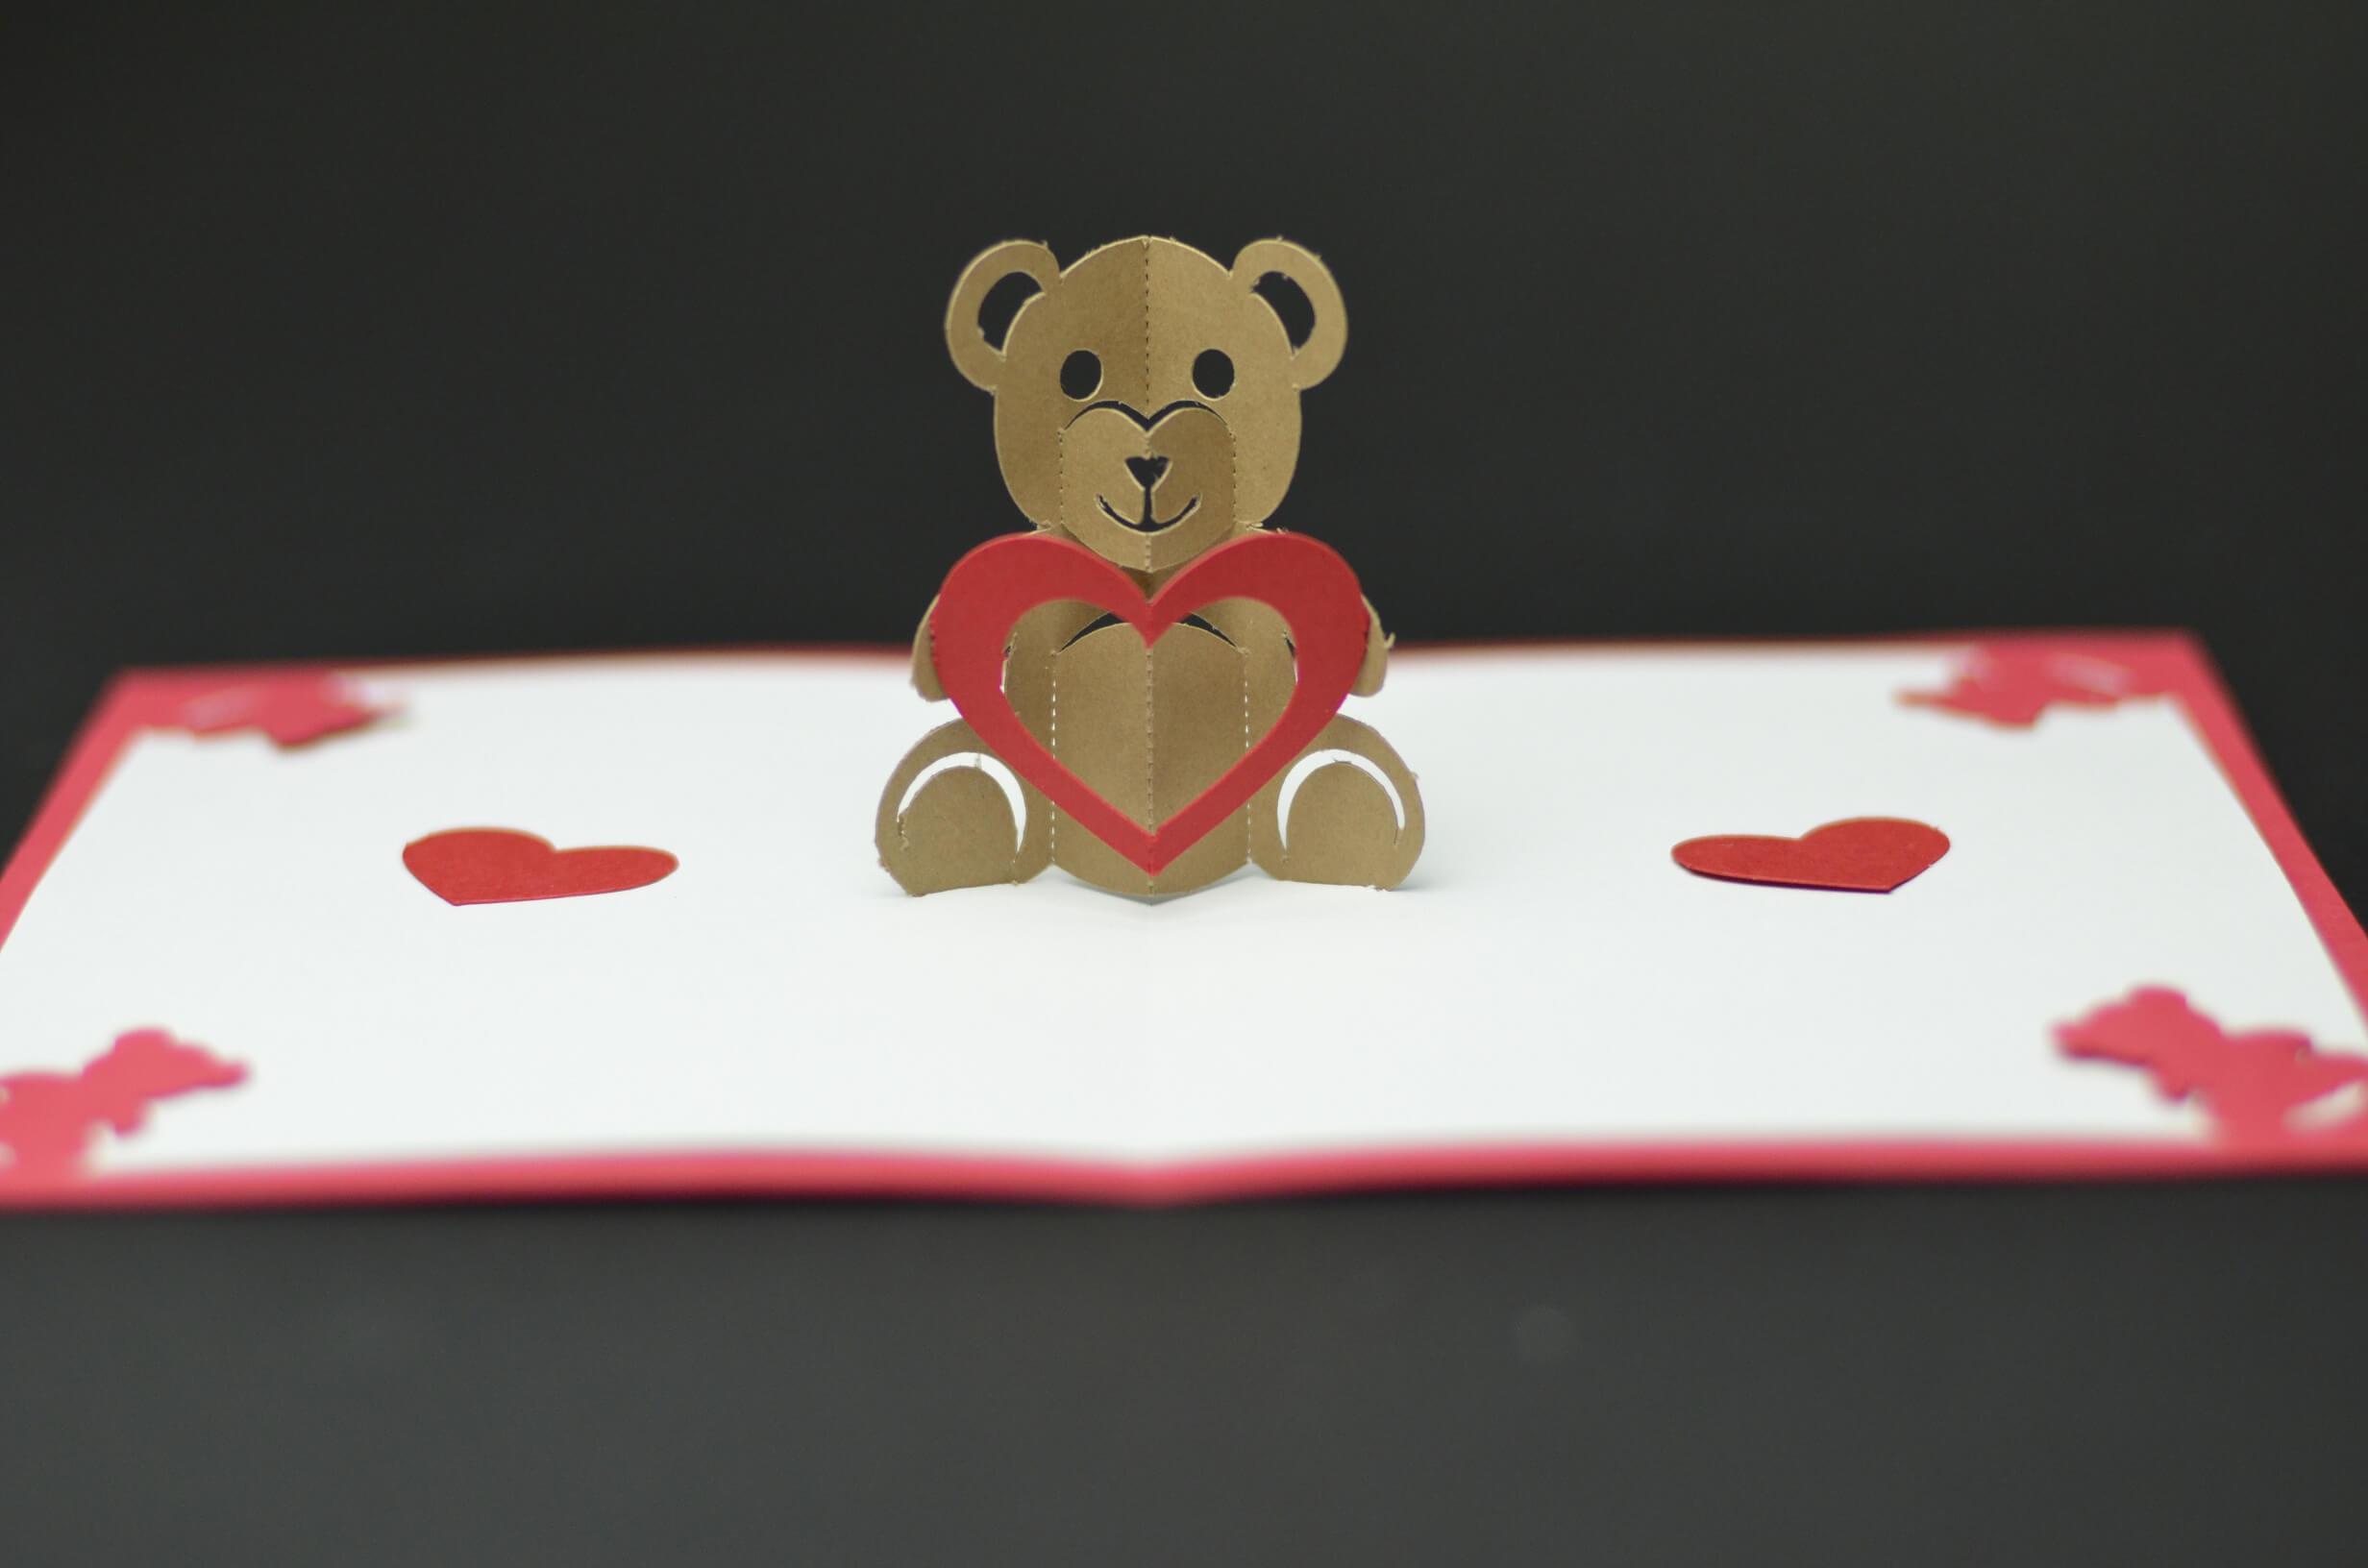 Pop Up Card Tutorials And Templates - Creative Pop Up Cards throughout Pop Up Card Templates Free Printable